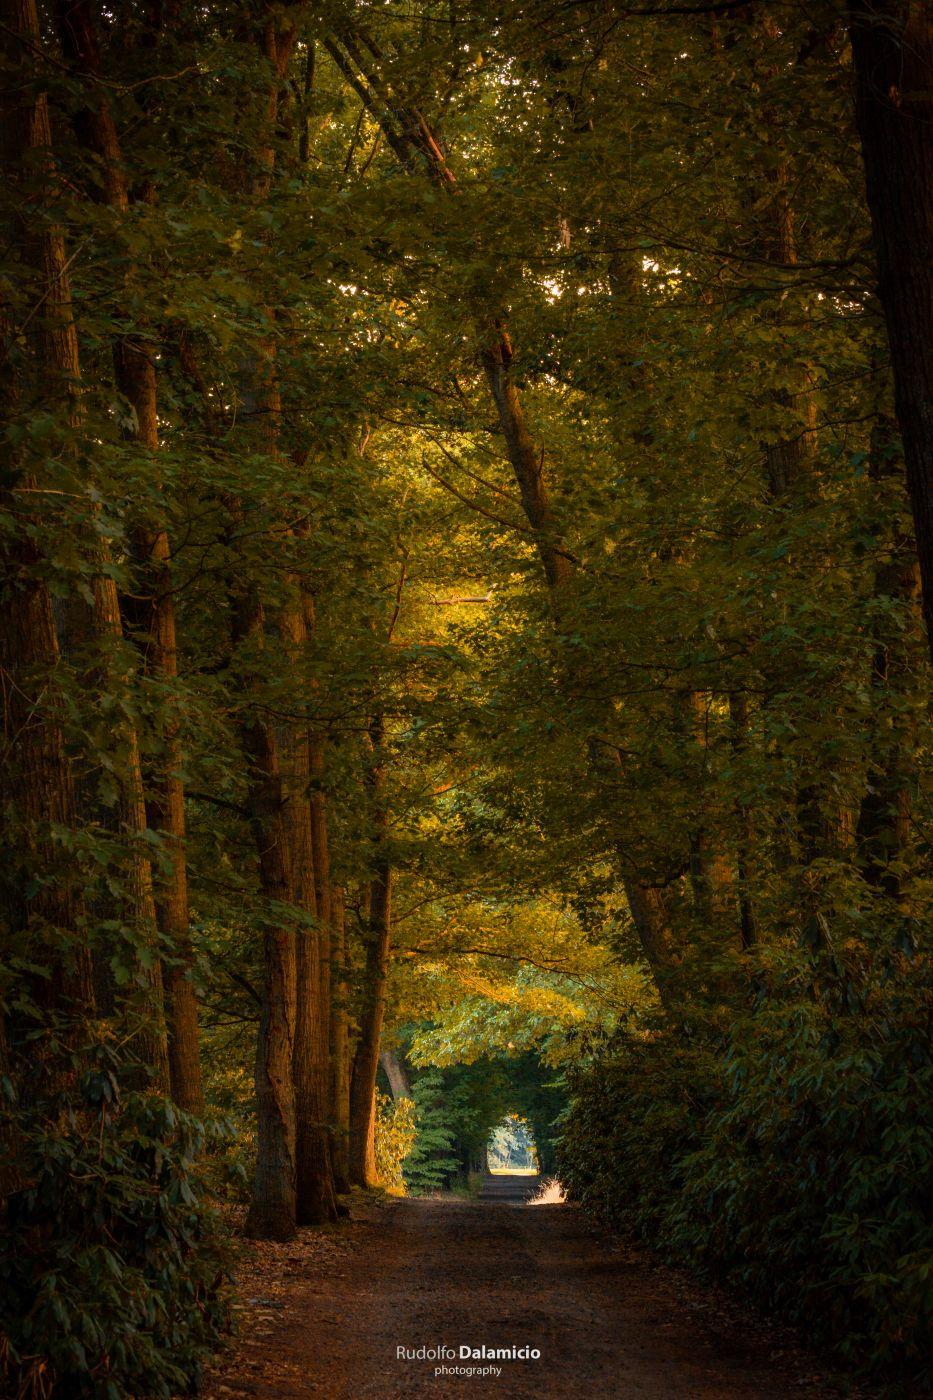 Tunnel Vision, Netherlands